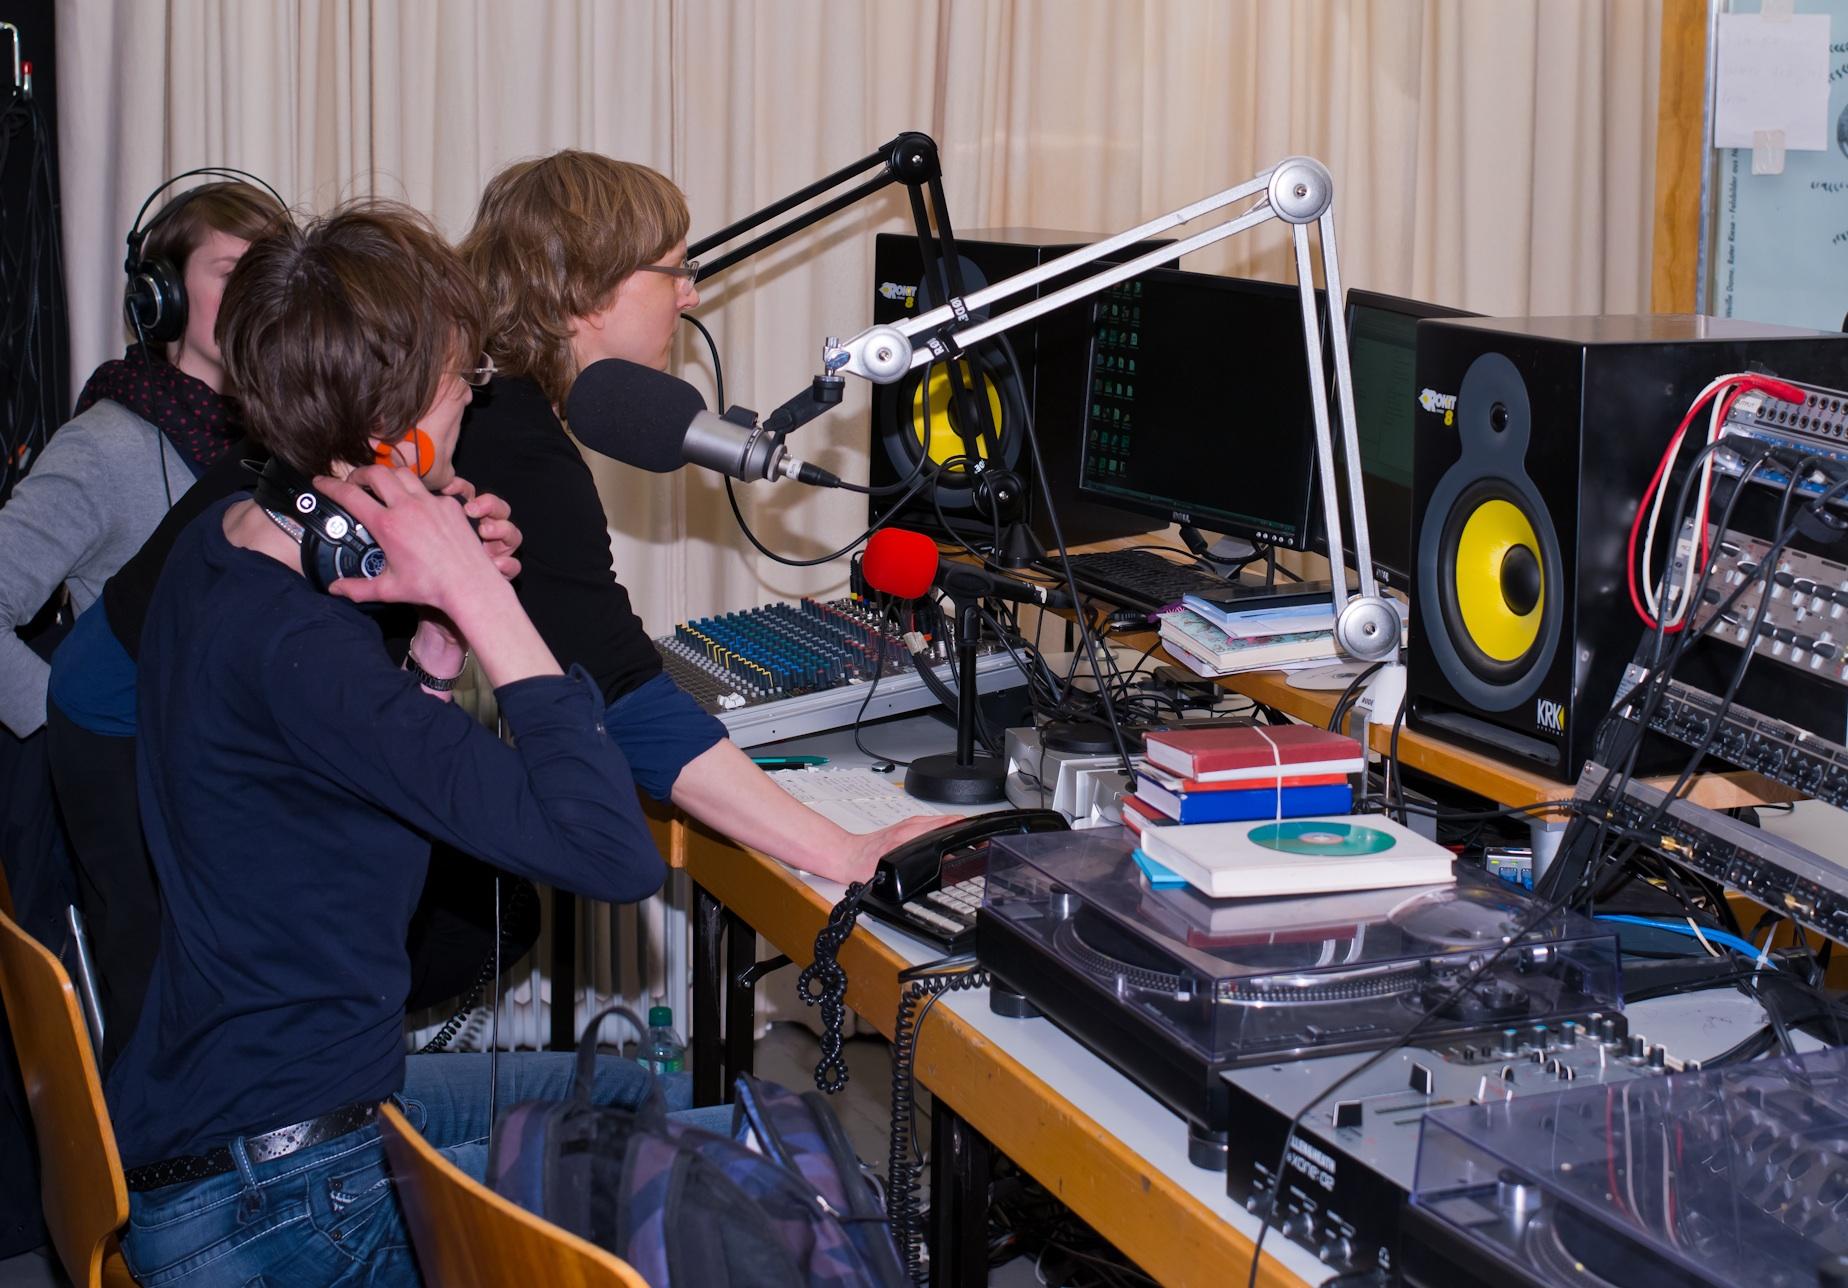 bei Klubradio unlimited GmbH